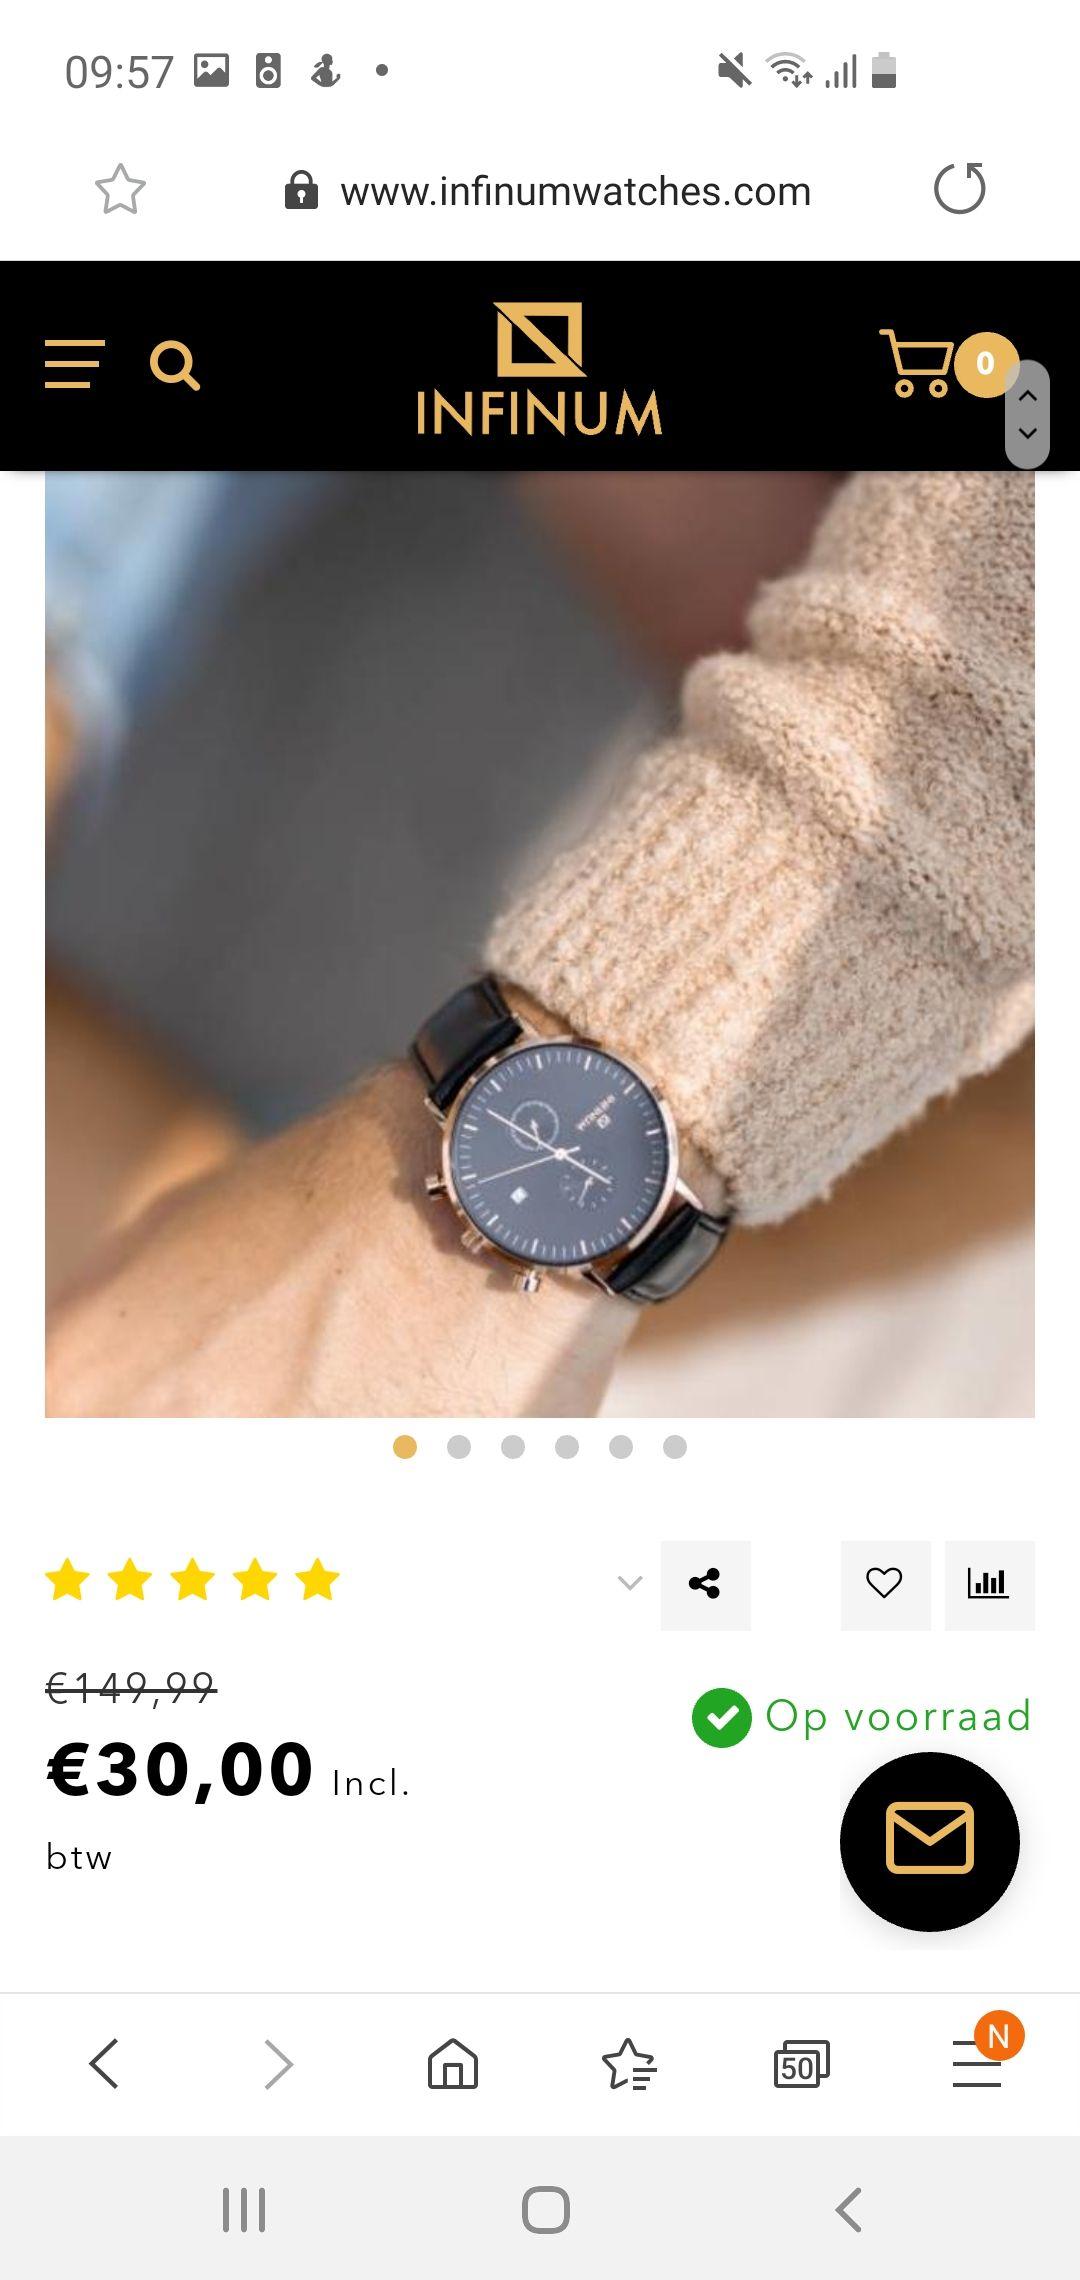 Leegverkoop Infinum horloges